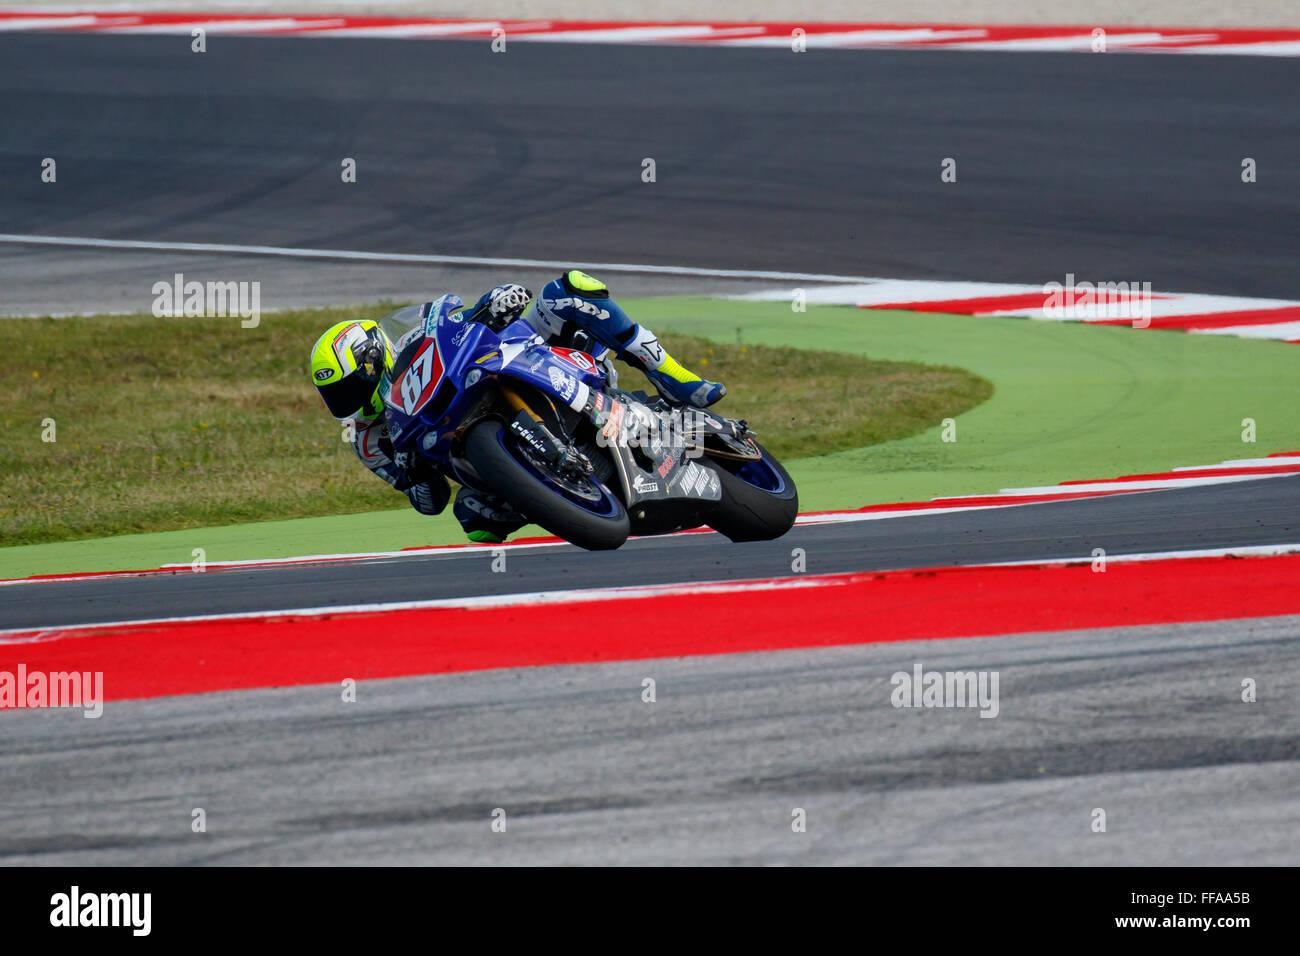 Misano Adriatico, Italy - June 20, 2015: Yamaha YZF R1 of Team Trasimeno, driven by MARCONI Luca Stock Photo